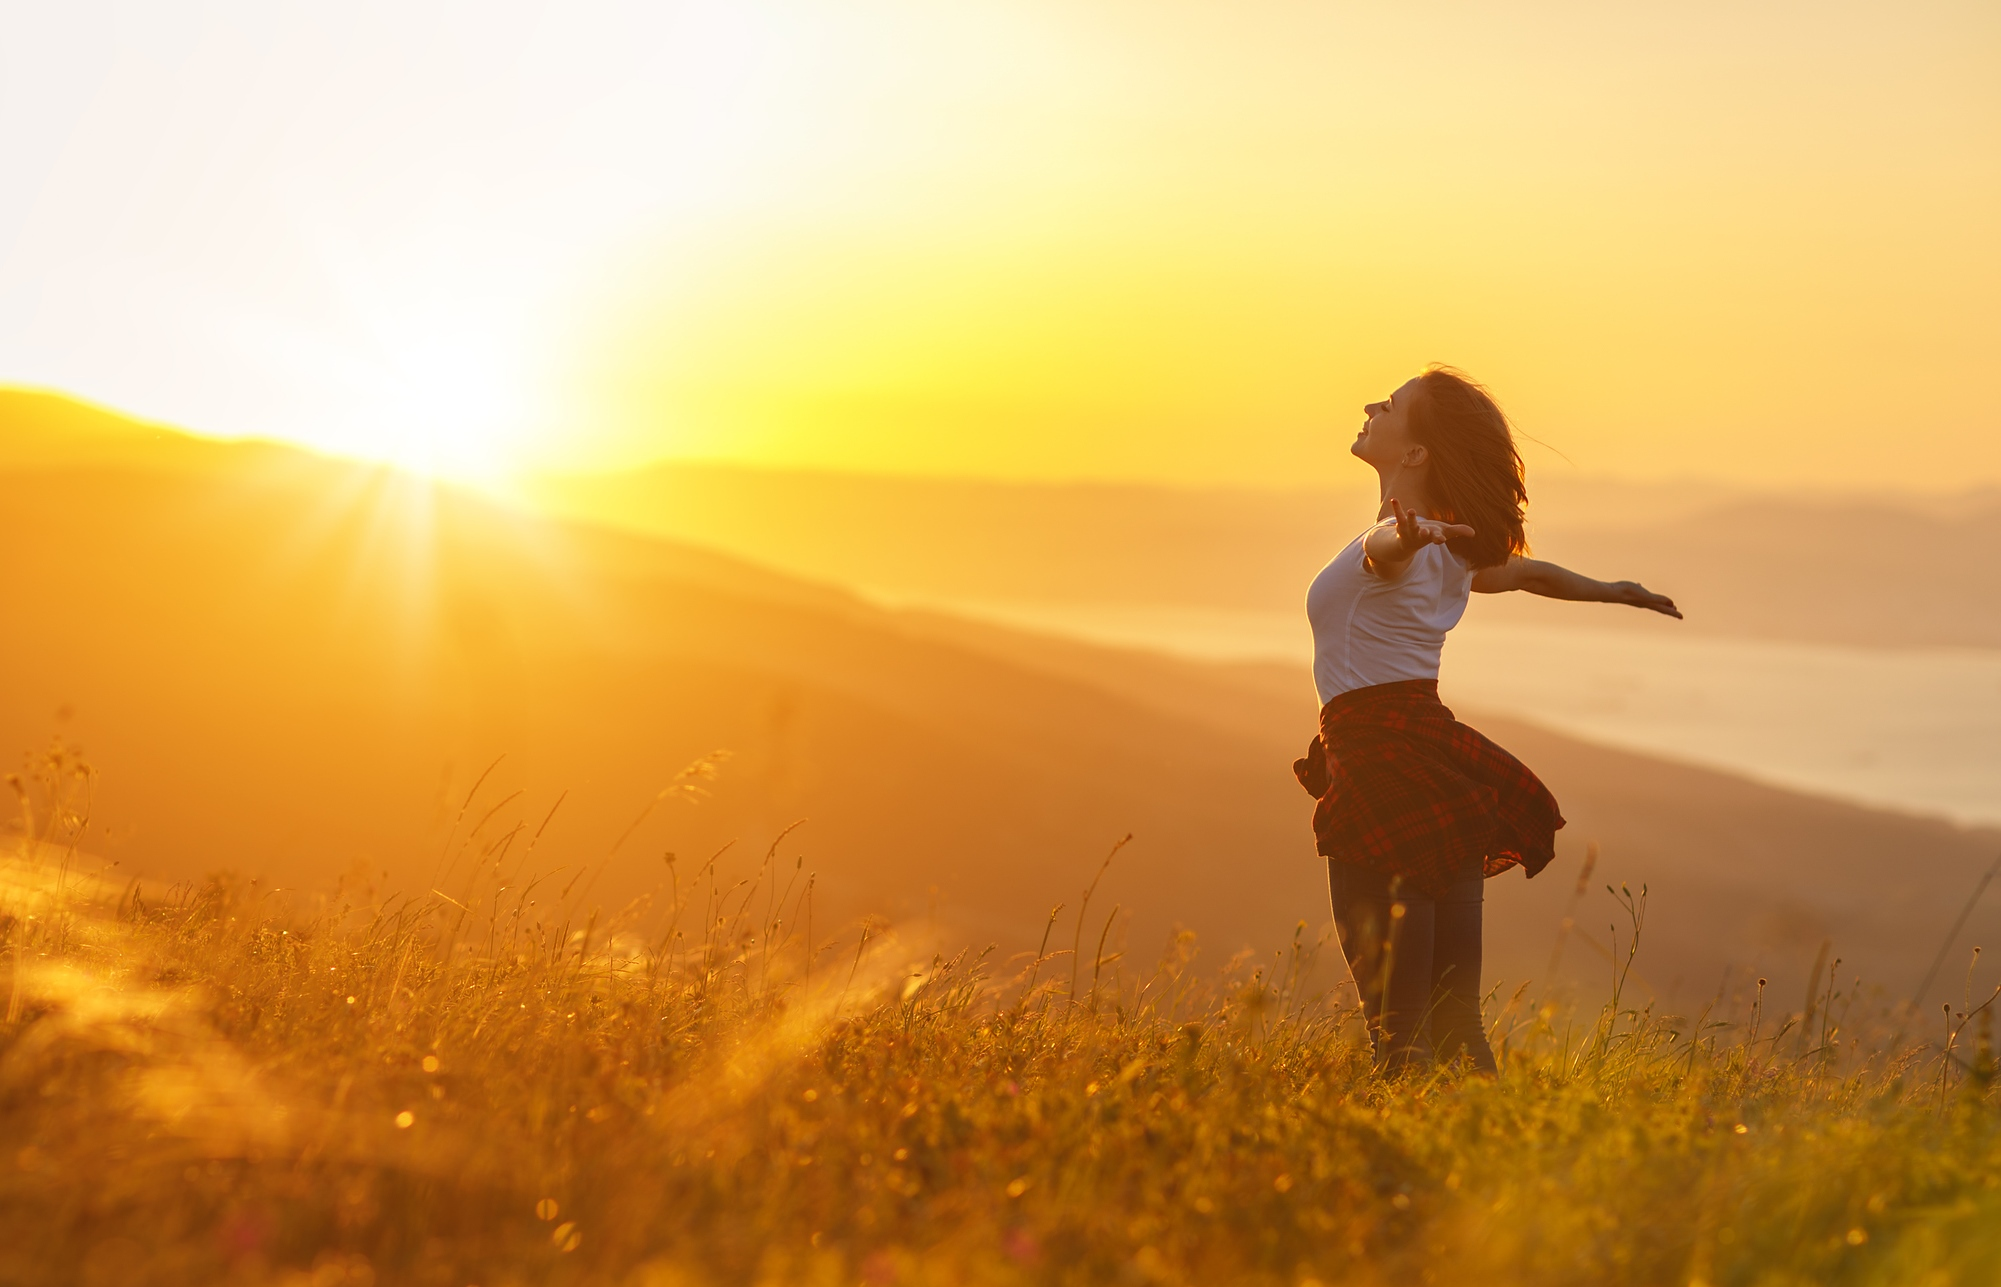 Vamos falar sobre felicidade: existe receita para ser feliz?